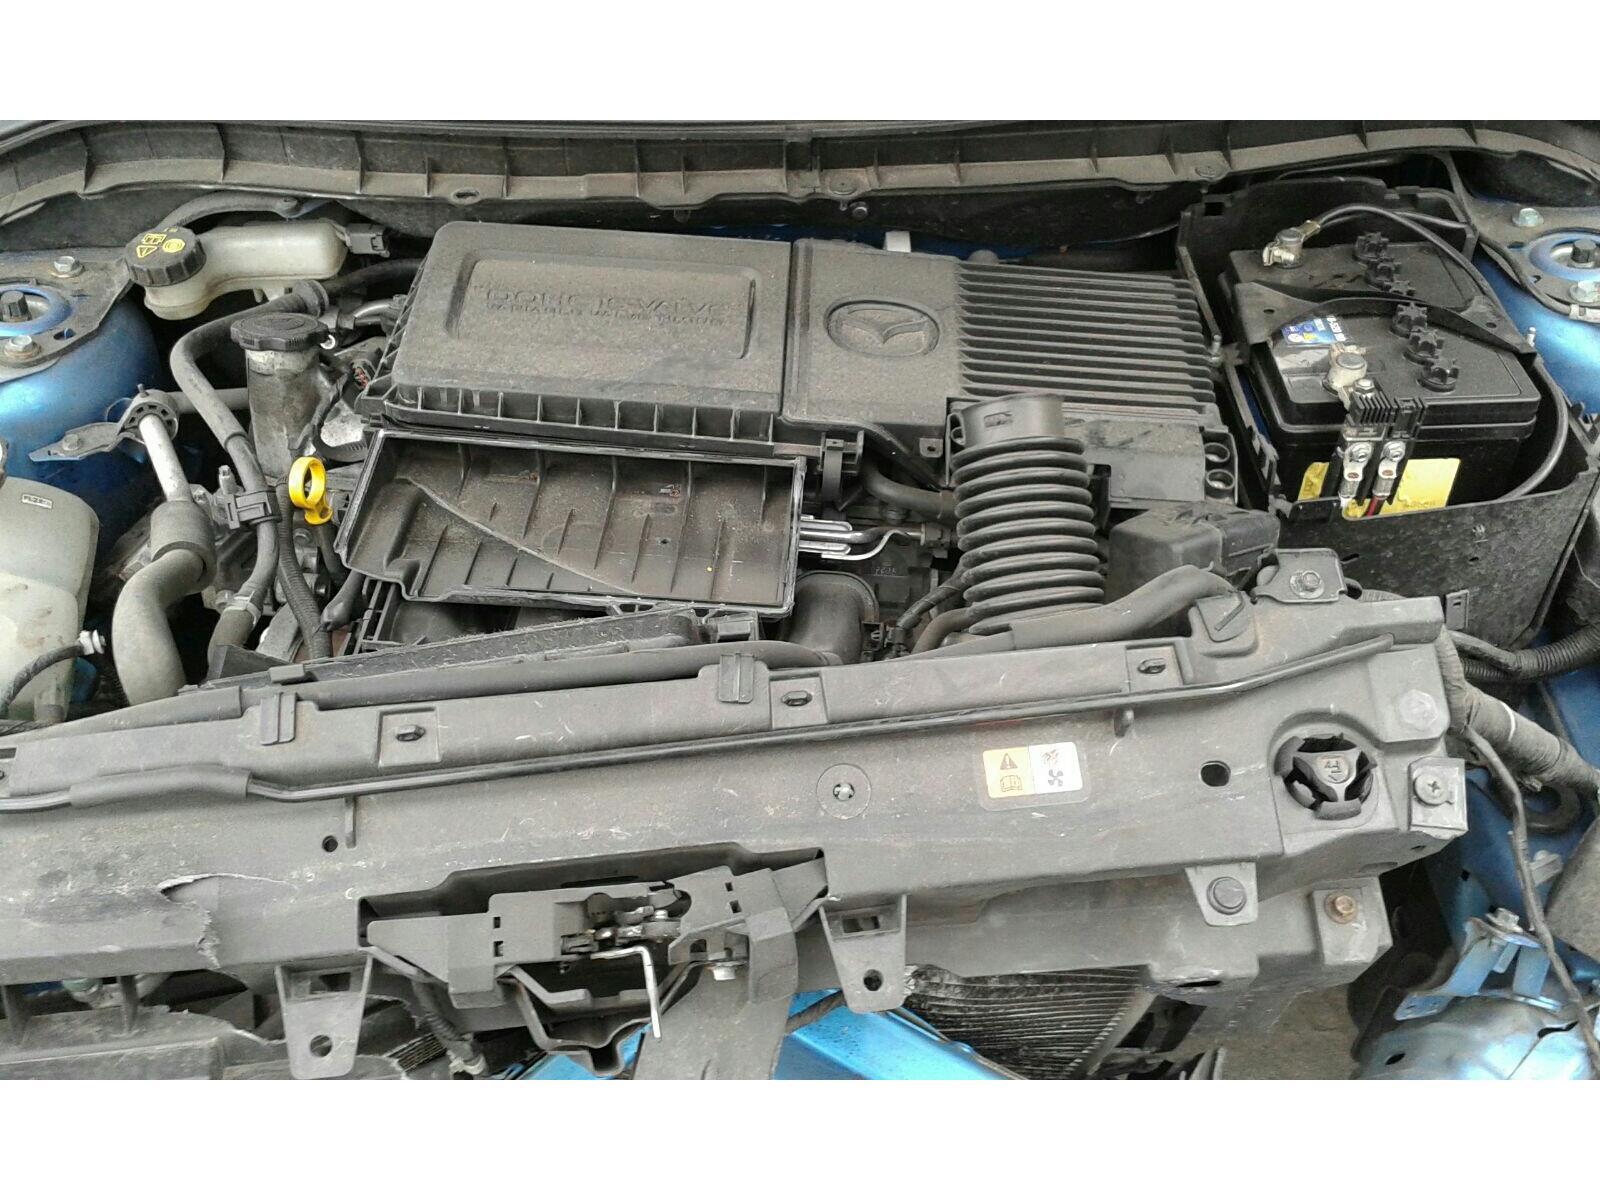 2009 Mazda 3 2008 To 2011 5 Door Hatchback Petrol Manual Engine Parts Diagram